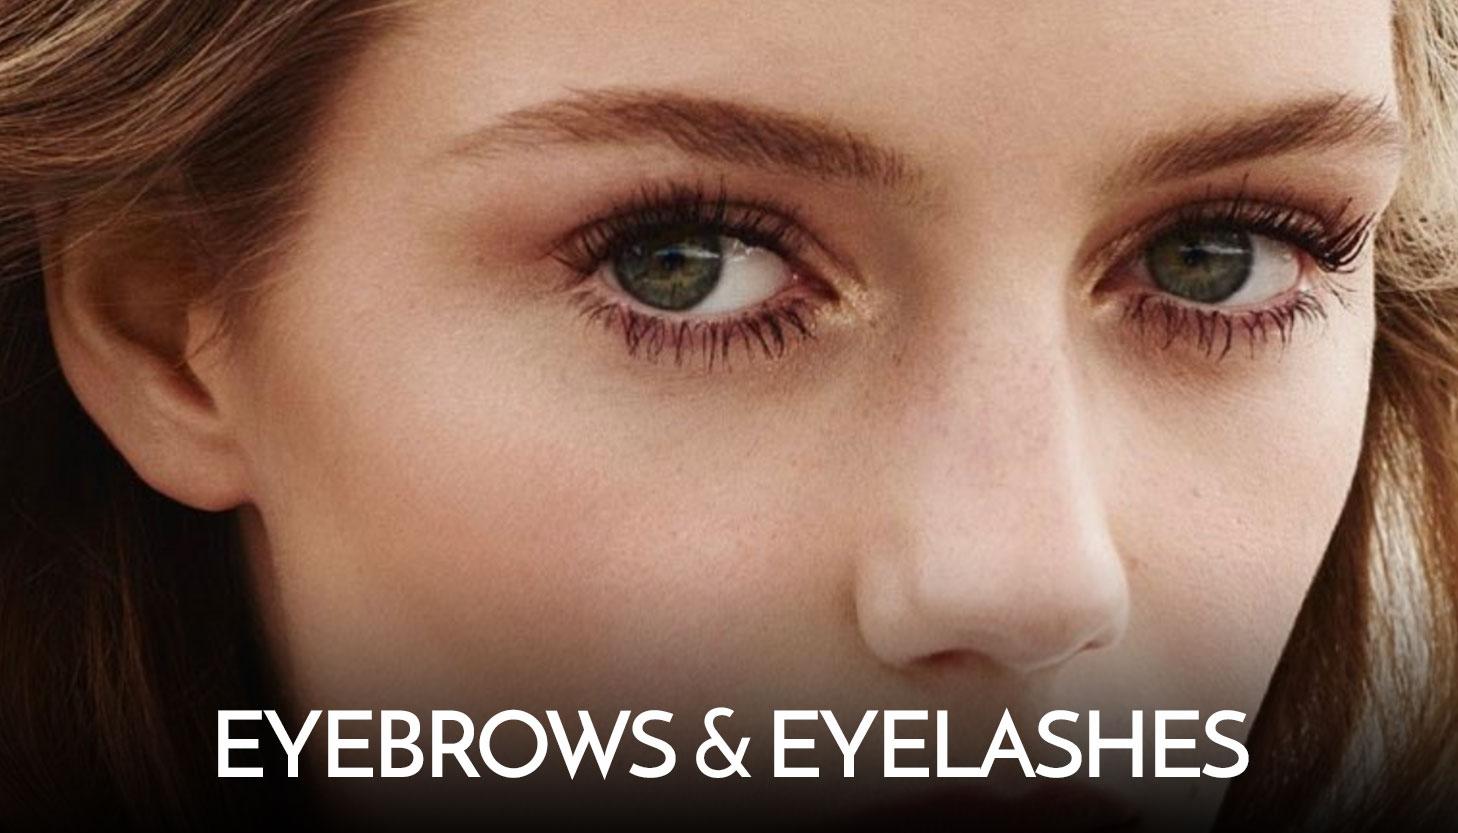 Eyebrows-&-eyelashes